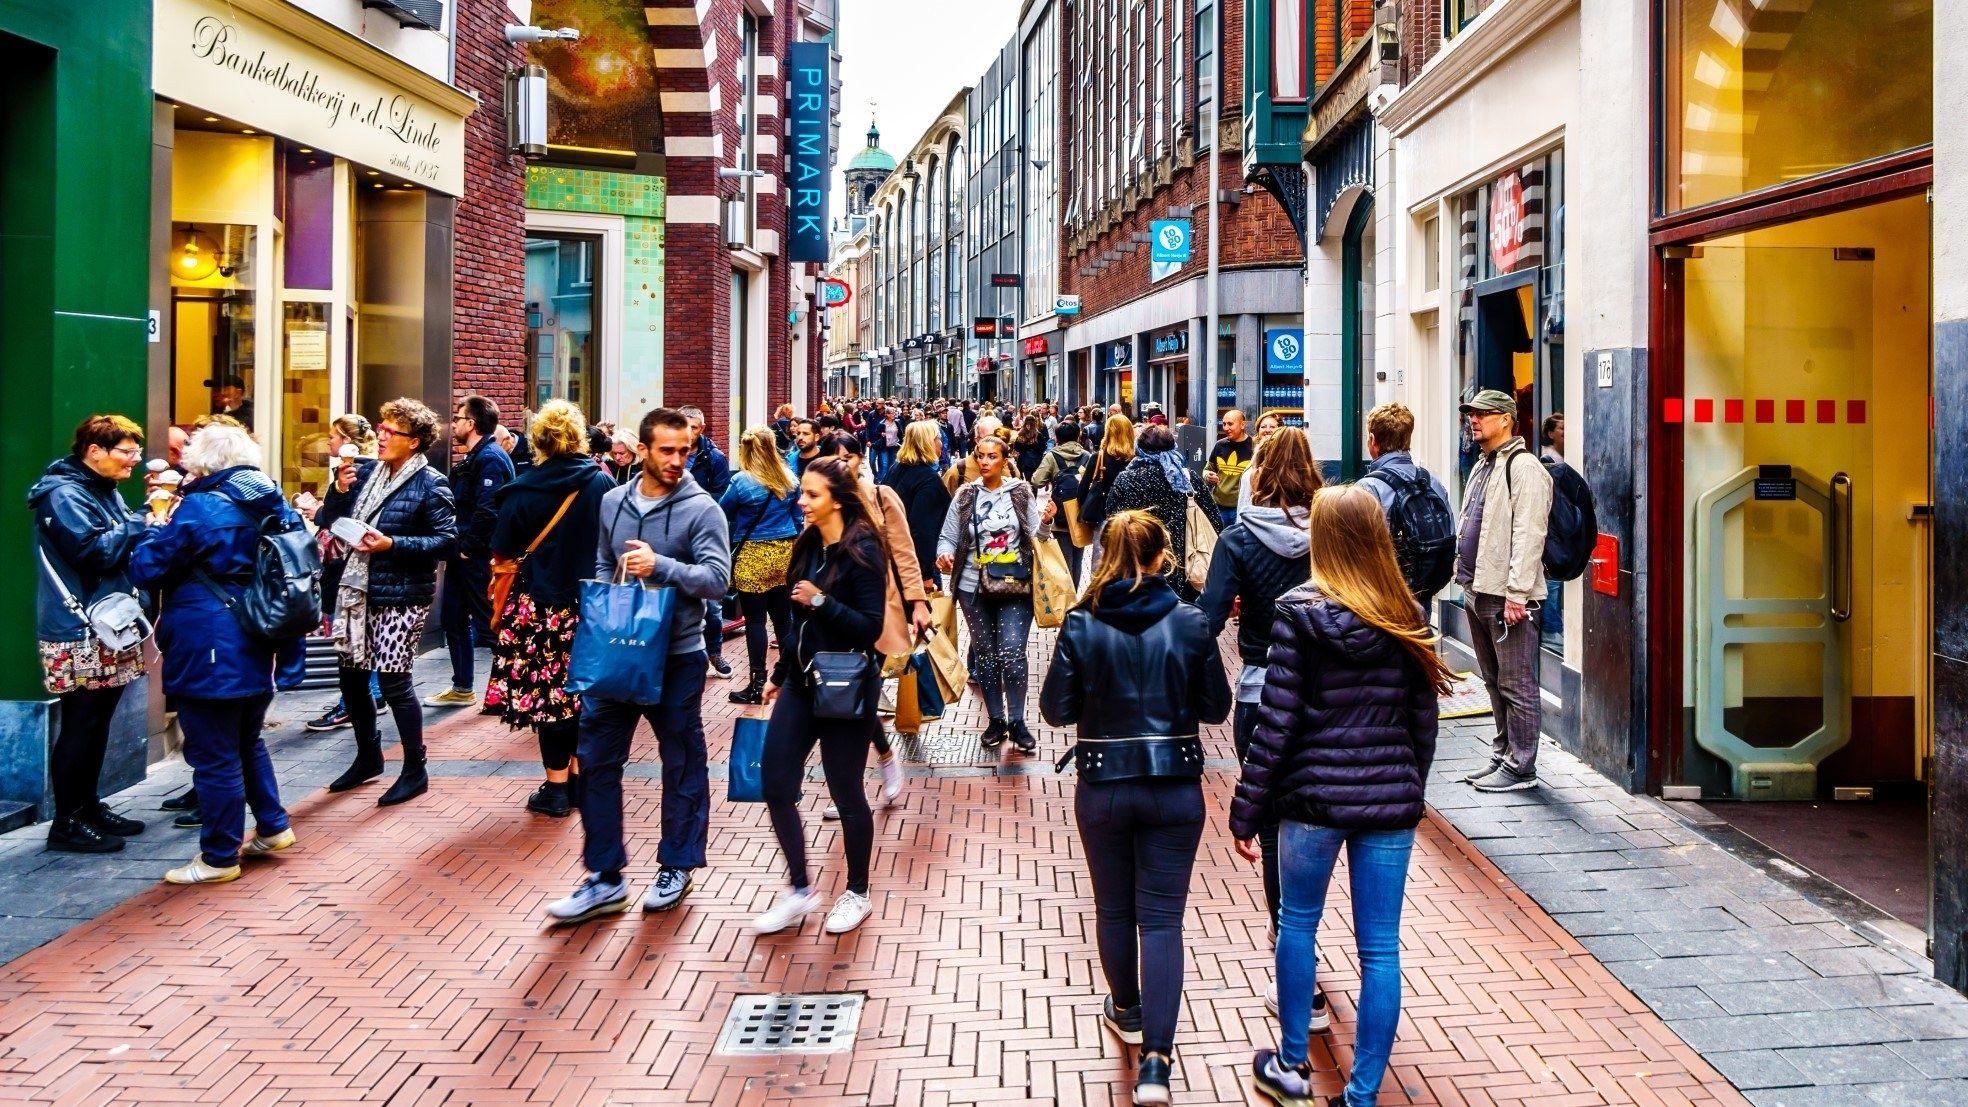 Winkelstraat druk amsterdam